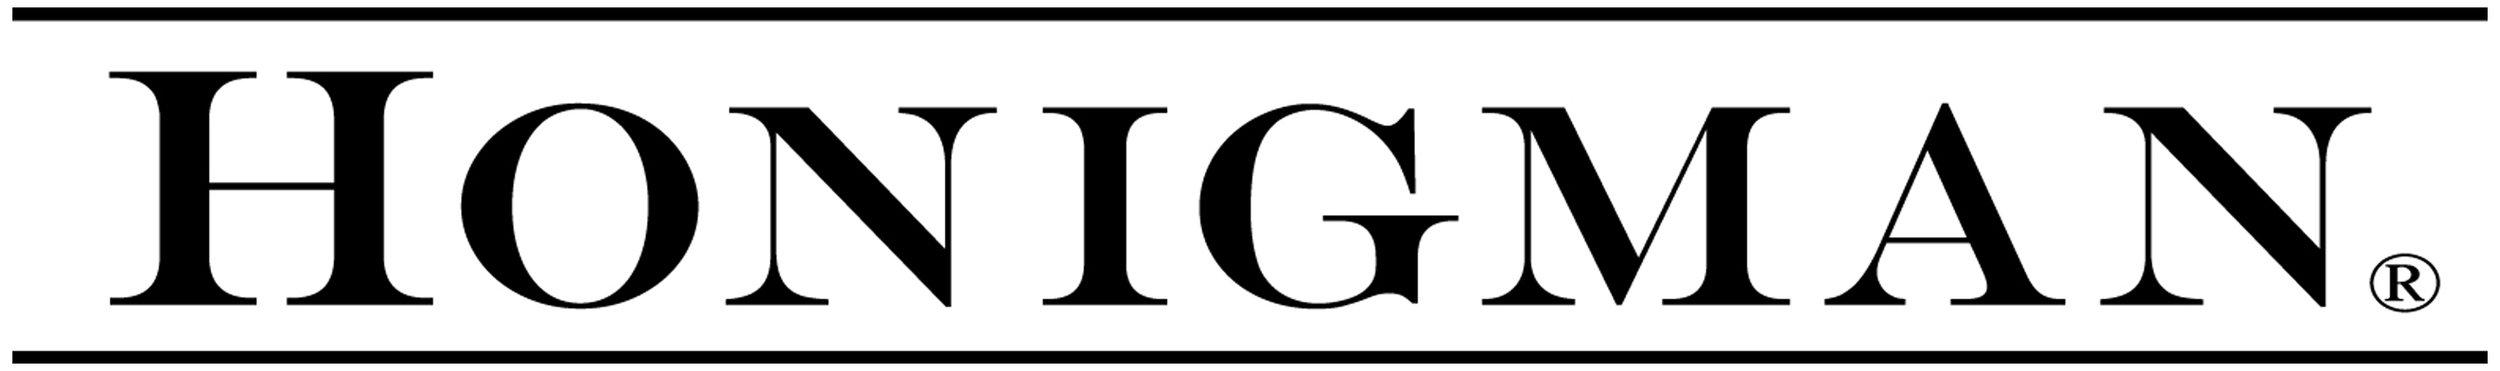 Honigman-Black-Logo-Reg-2012.jpg